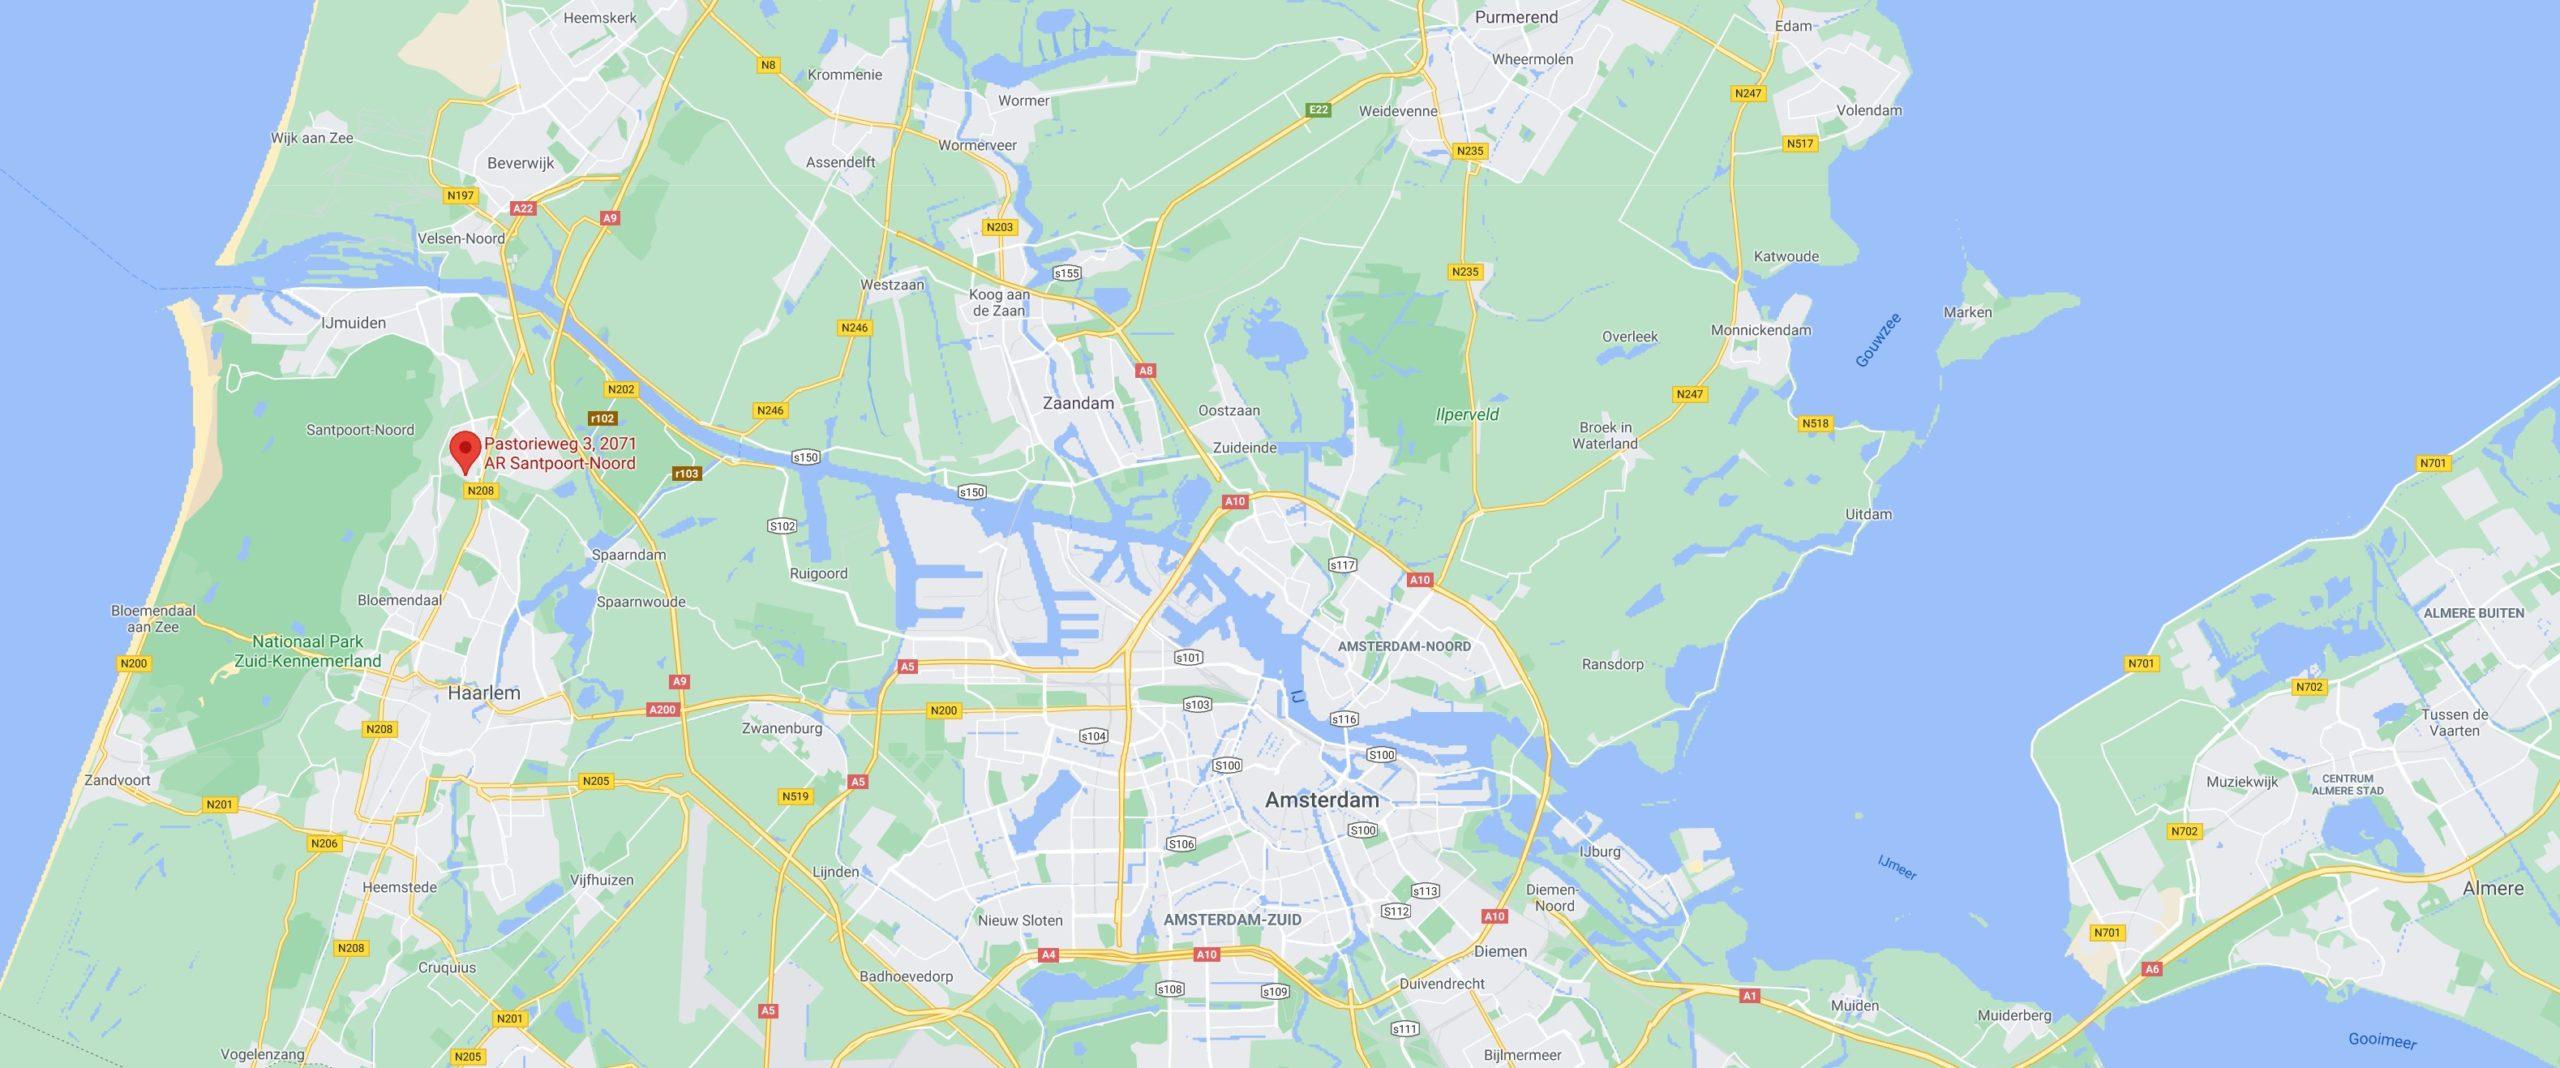 kaart Haarlem-Amsterdam